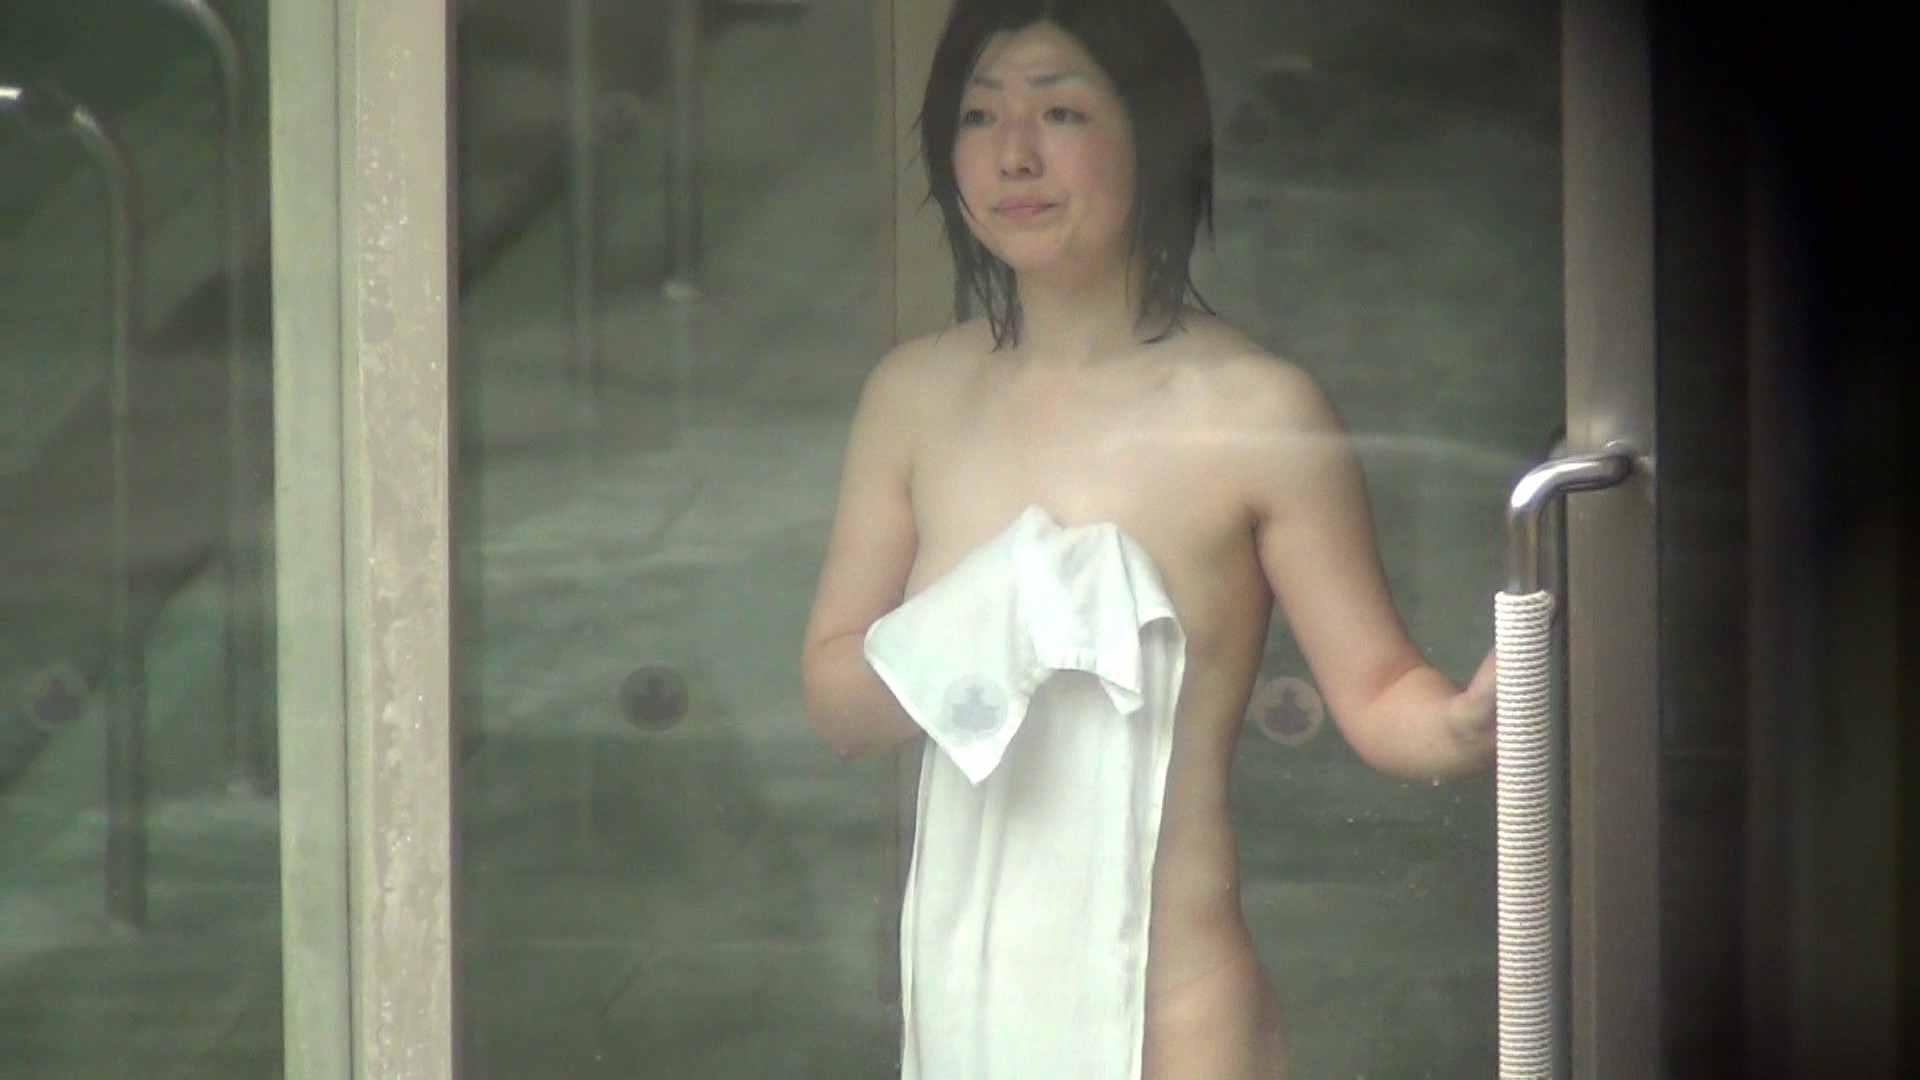 Aquaな露天風呂Vol.313 HなOL | 盗撮  66pic 14